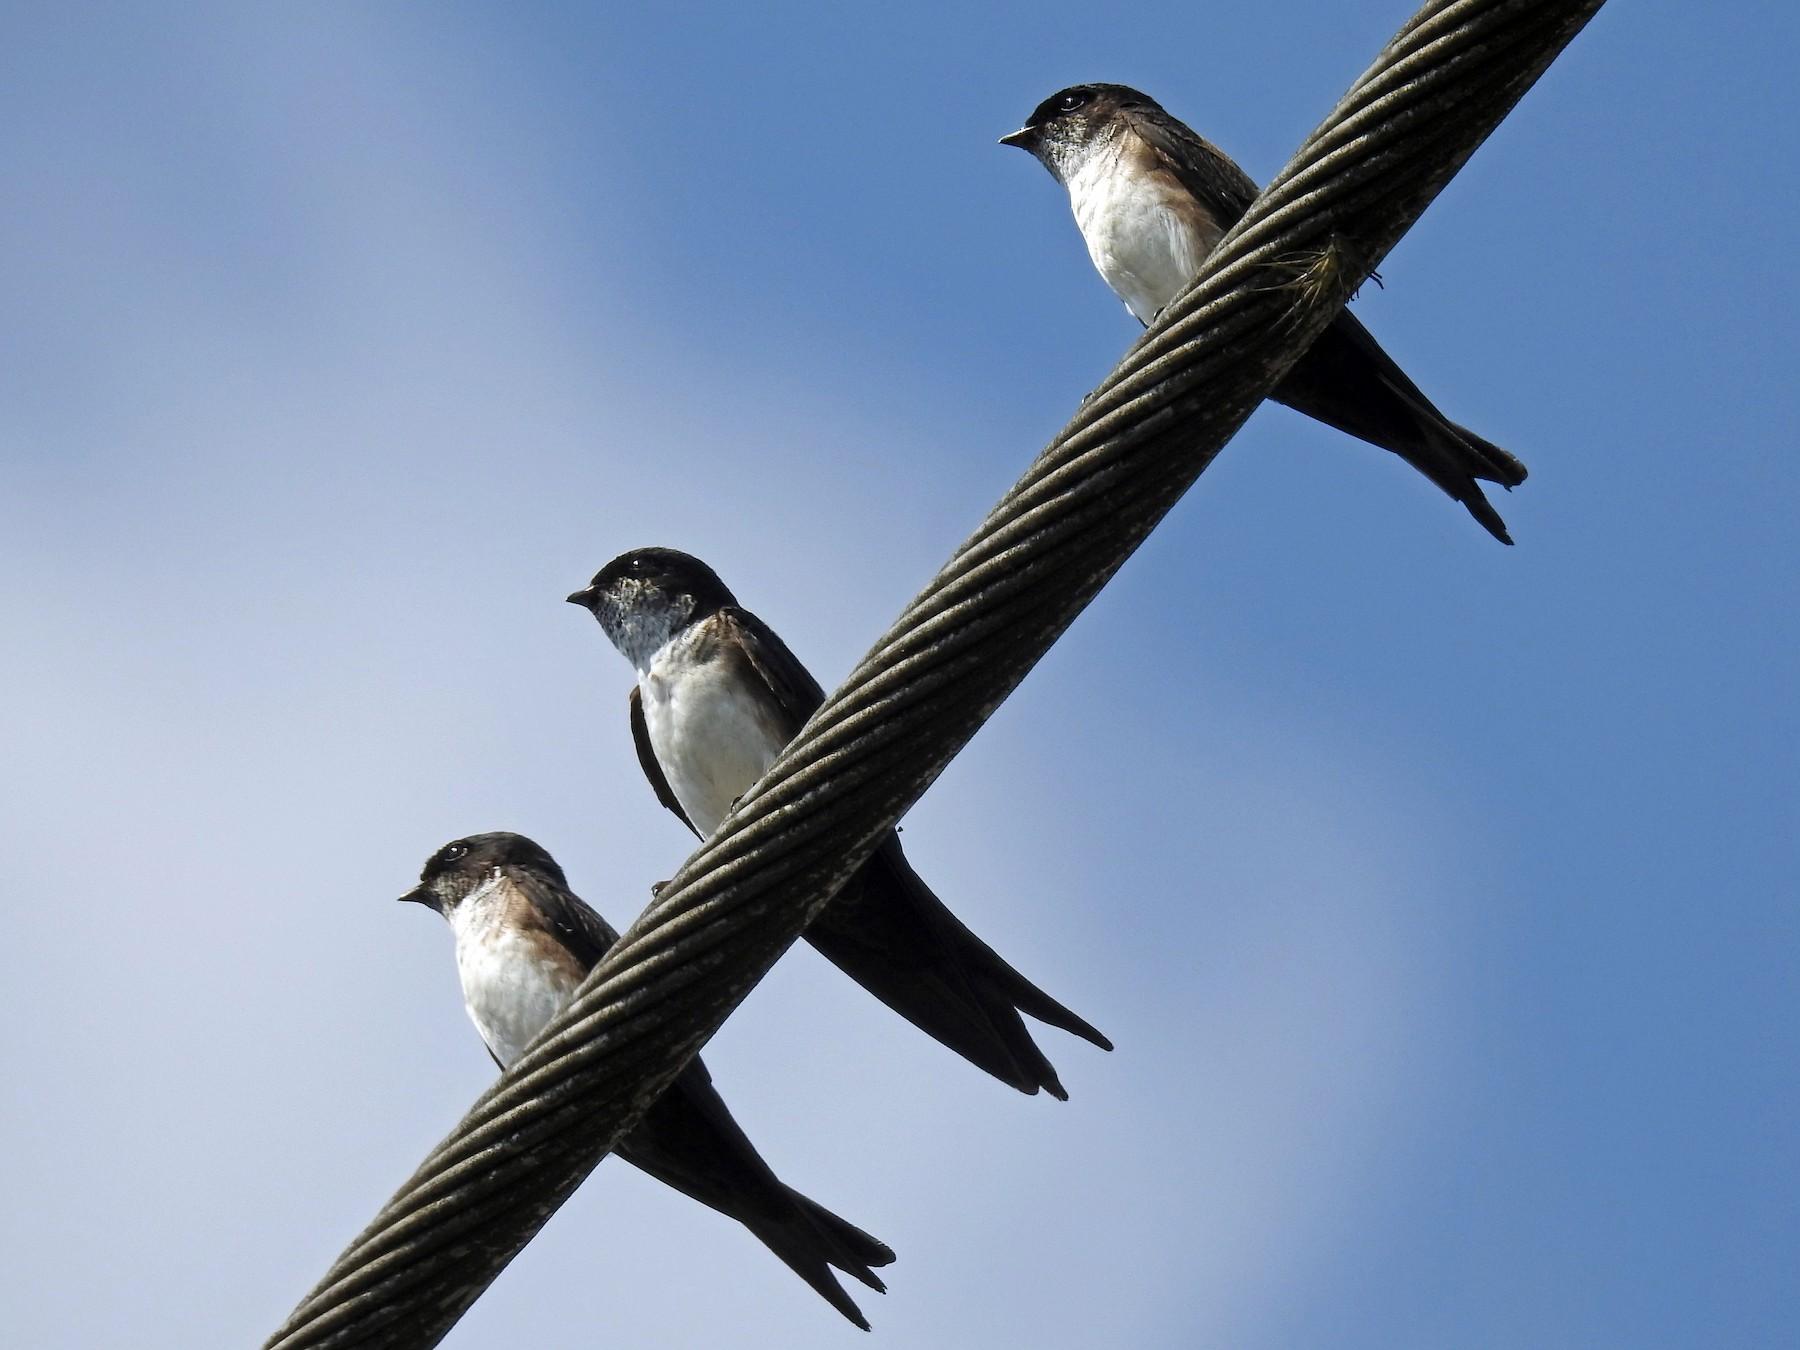 Black-capped Swallow - Rudy Botzoc